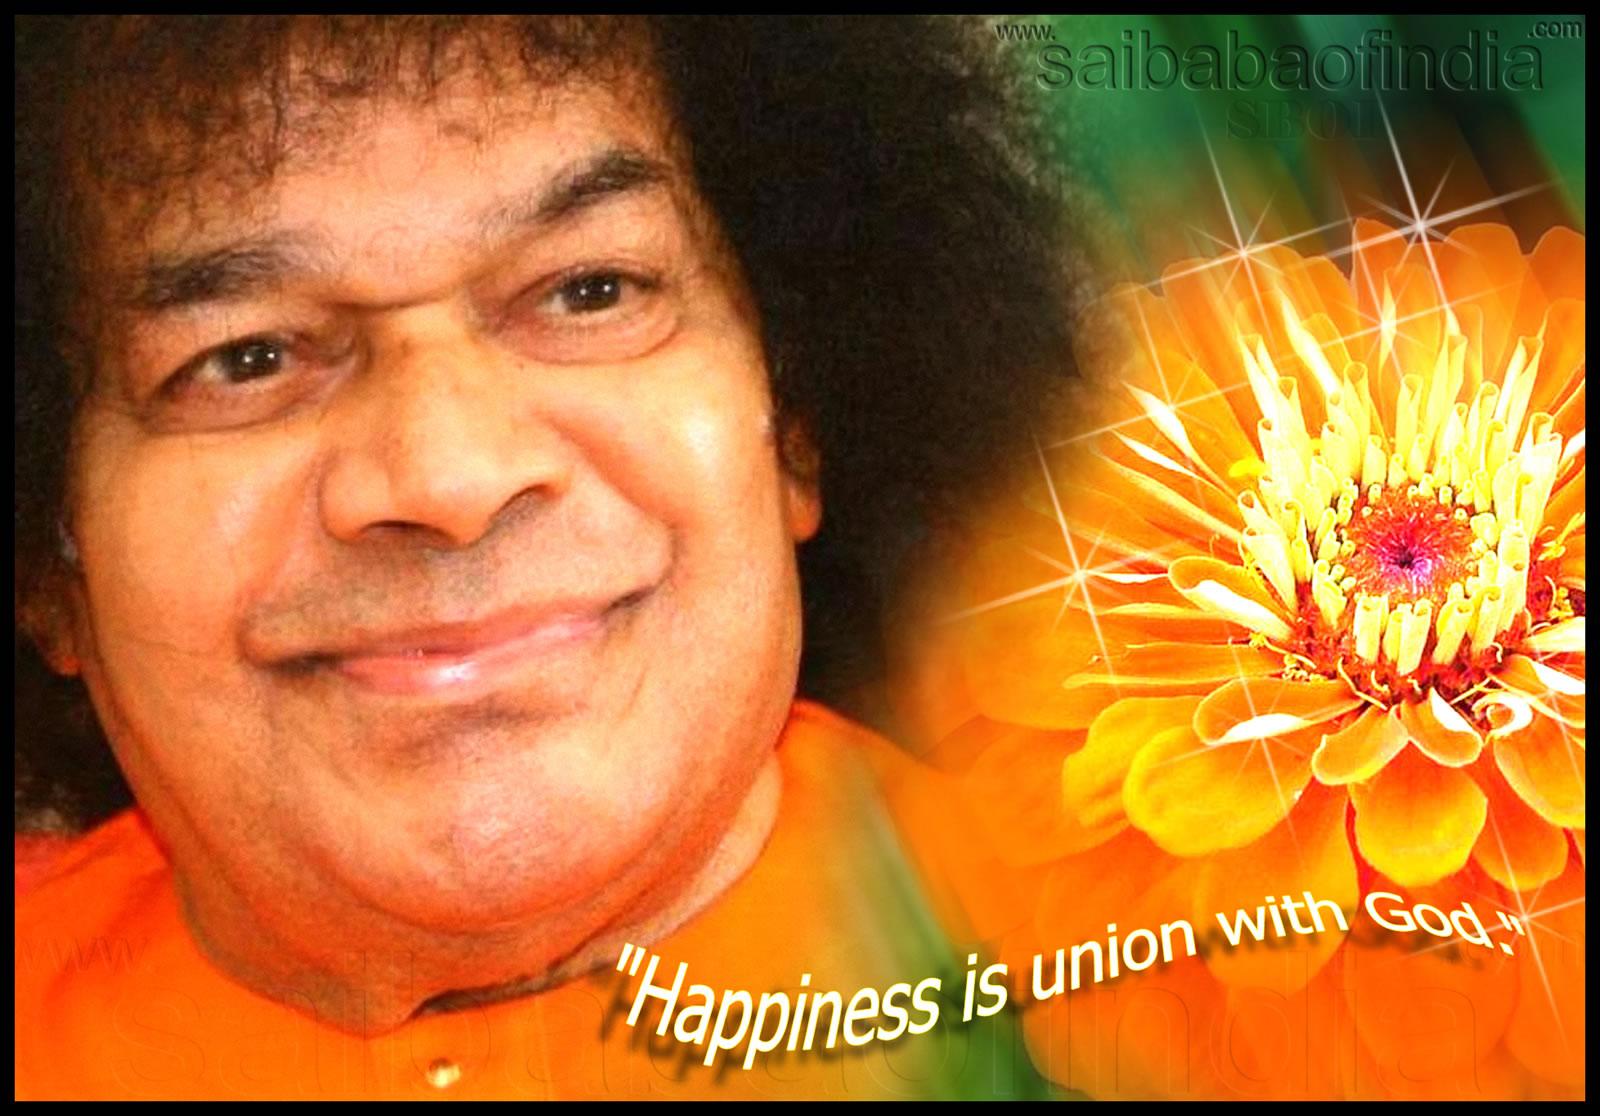 ... IS UNION WITH GOD - SRI SATHYA SAI BABA - PHOTO OF SAI BABA SMILING